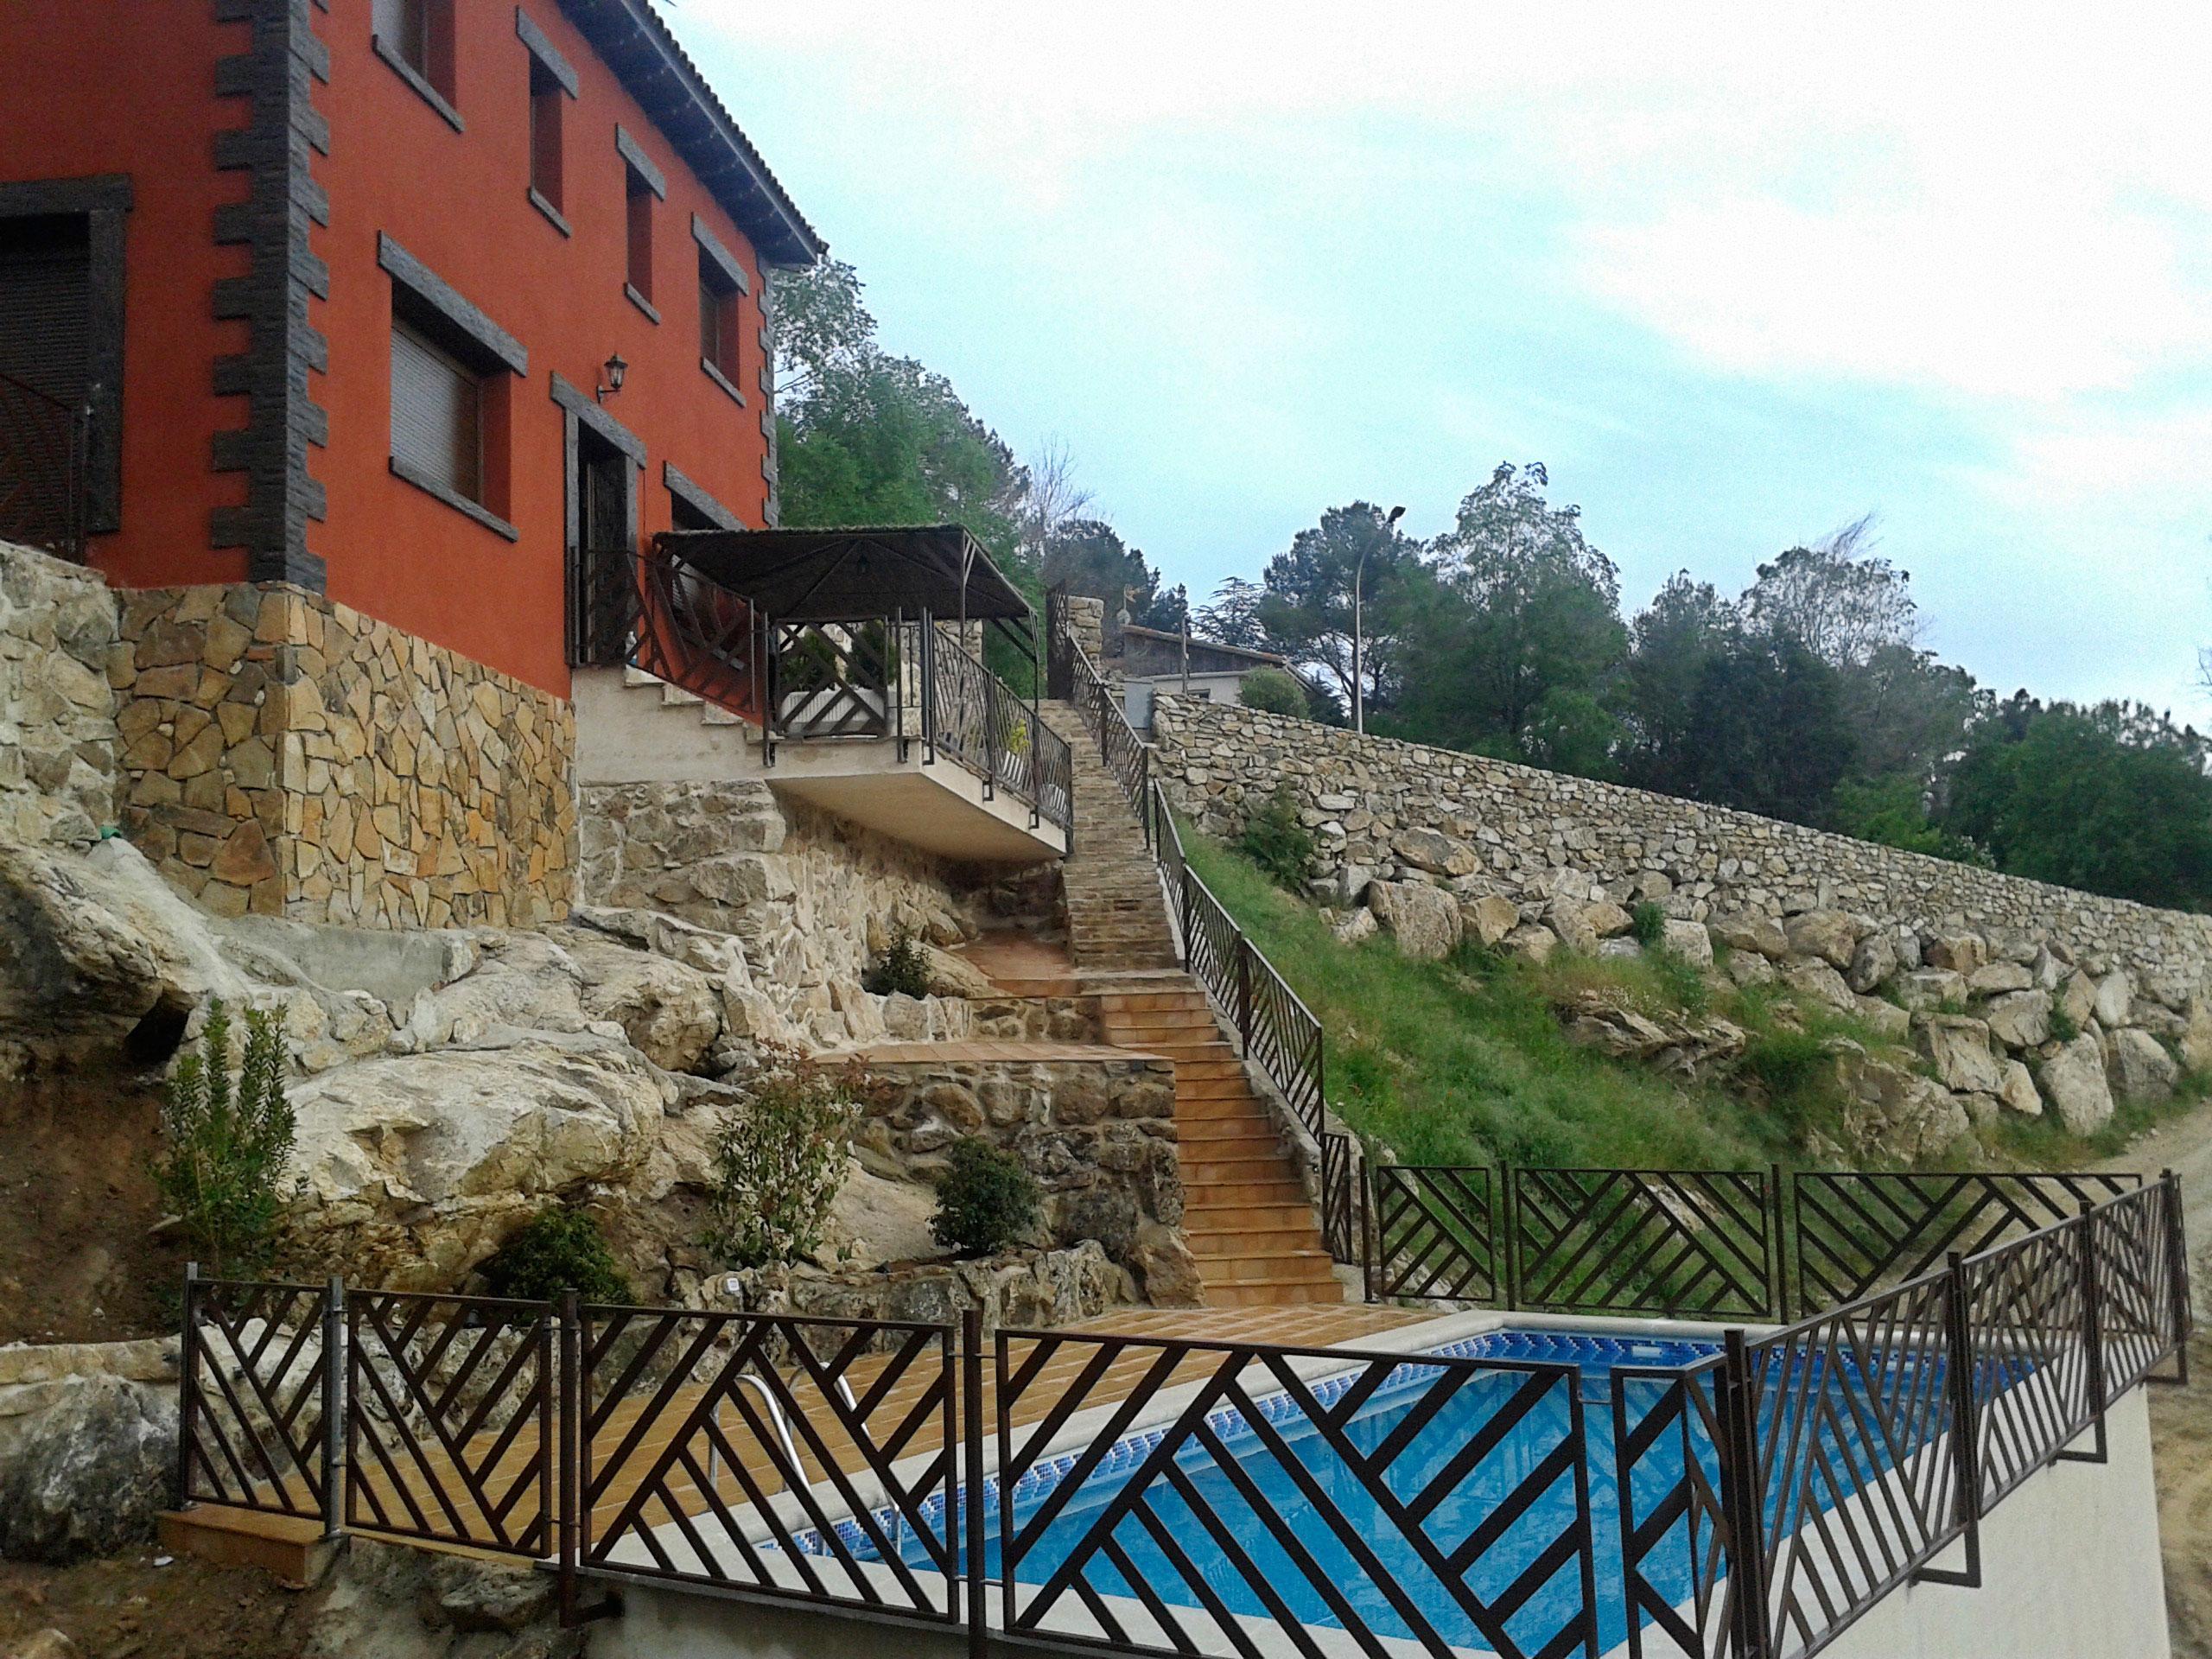 11 casas rurales con piscina para ir con ni os las casas for Casas rurales sierra de madrid con piscina